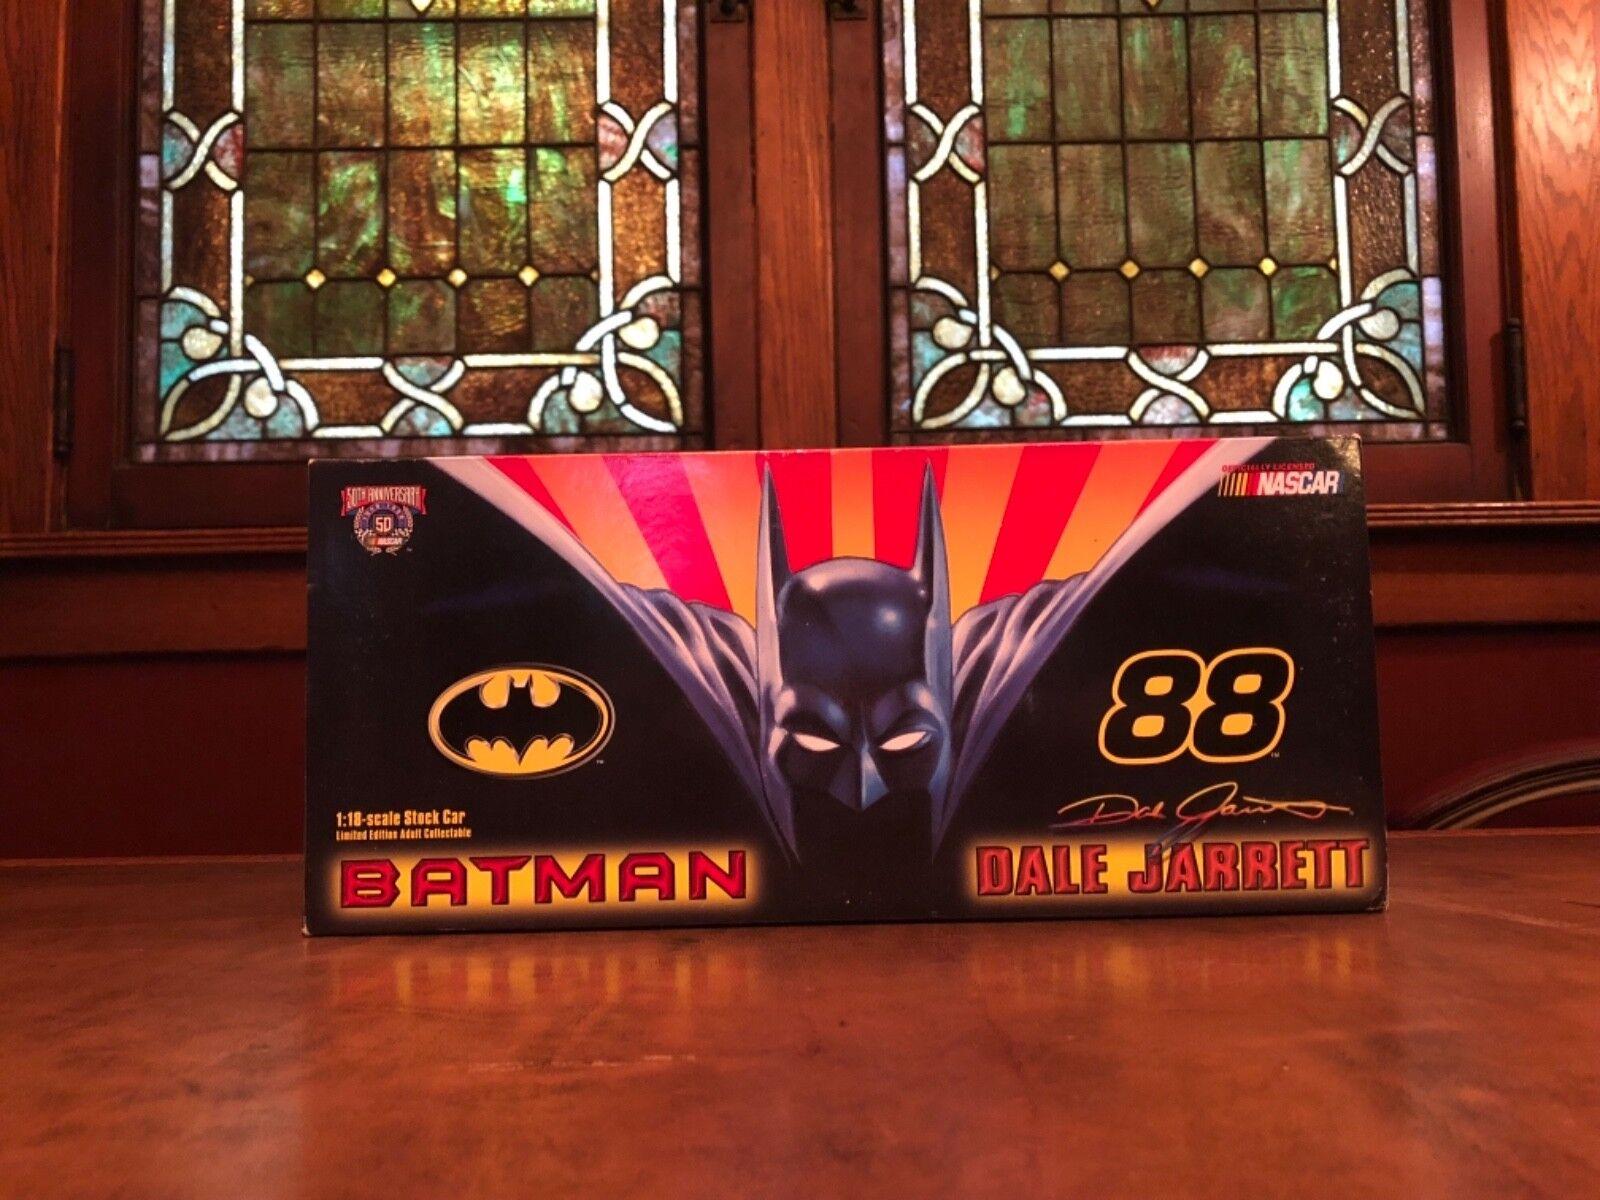 Dale Jarrett Batman 1 18 NASCAR Action Diecast Ford Taurus